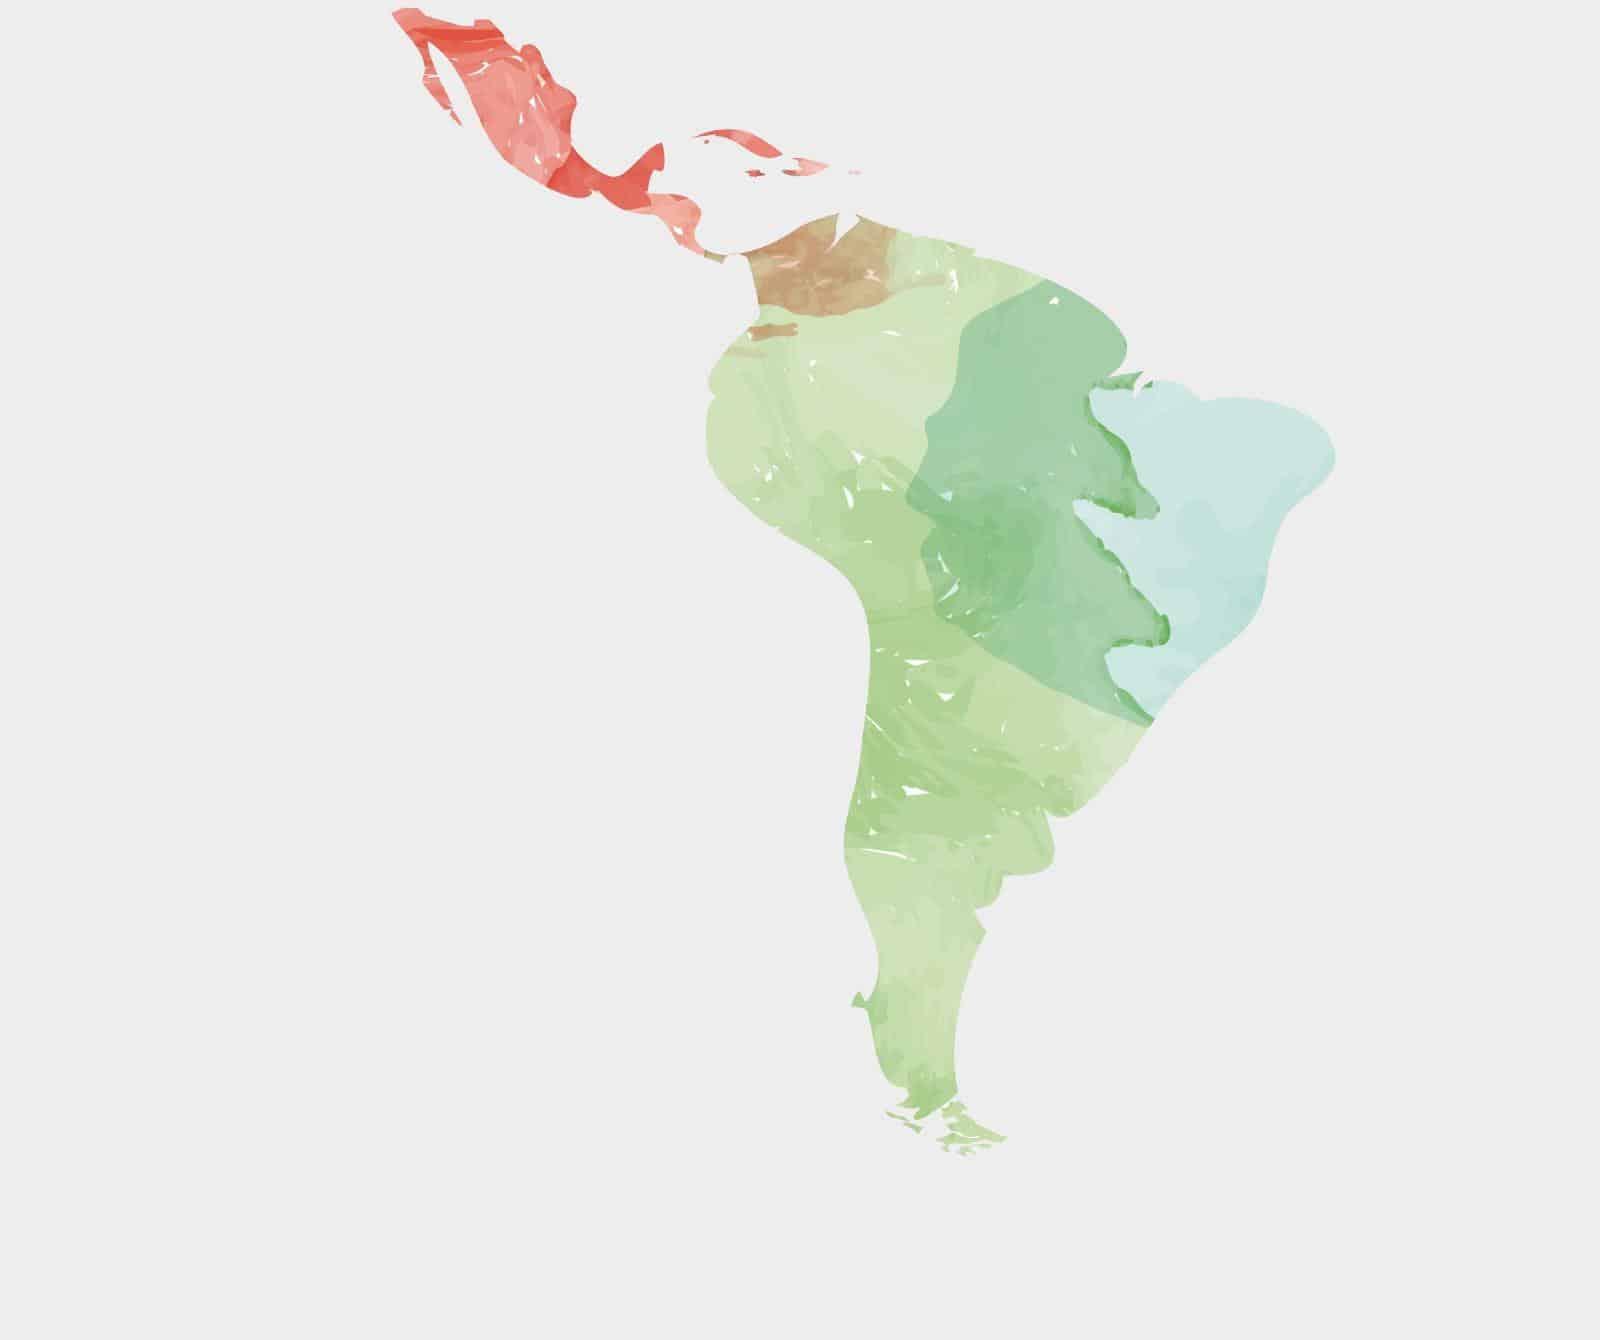 latin america category